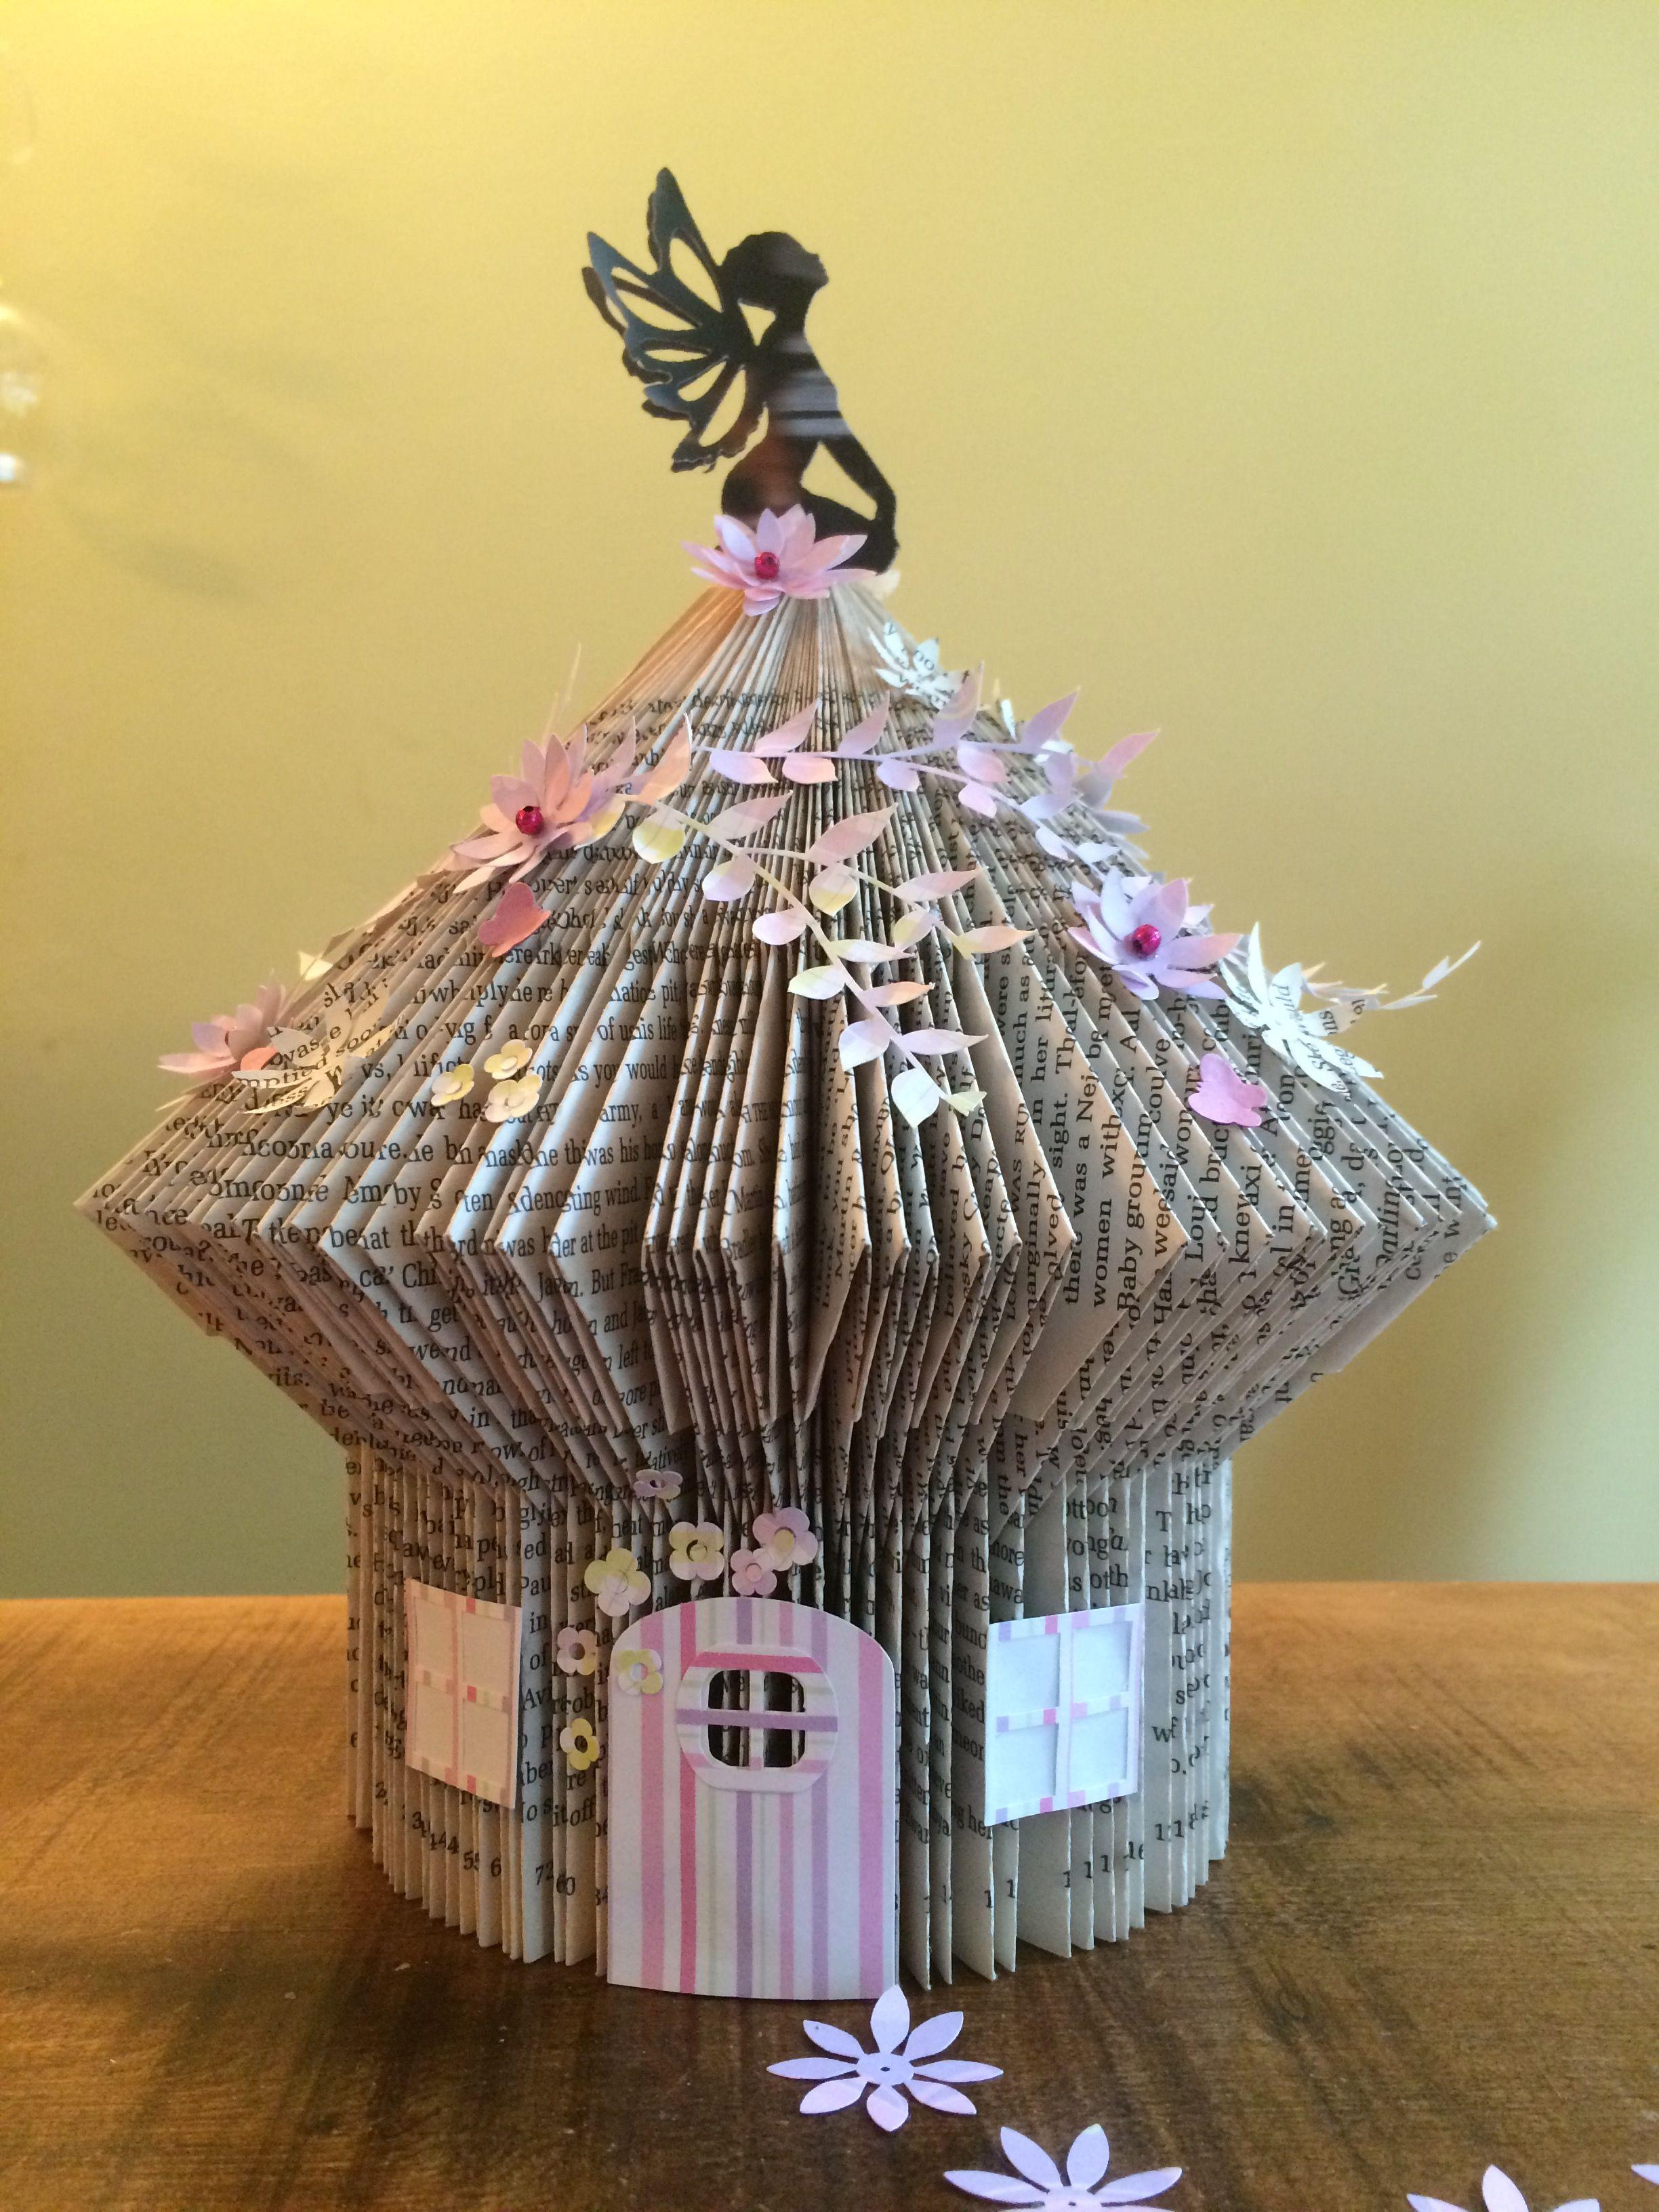 book art fairy house blogs workanyware co uk u2022 rh blogs workanyware co uk Fairy House Stuff Making Fairy Houses Book